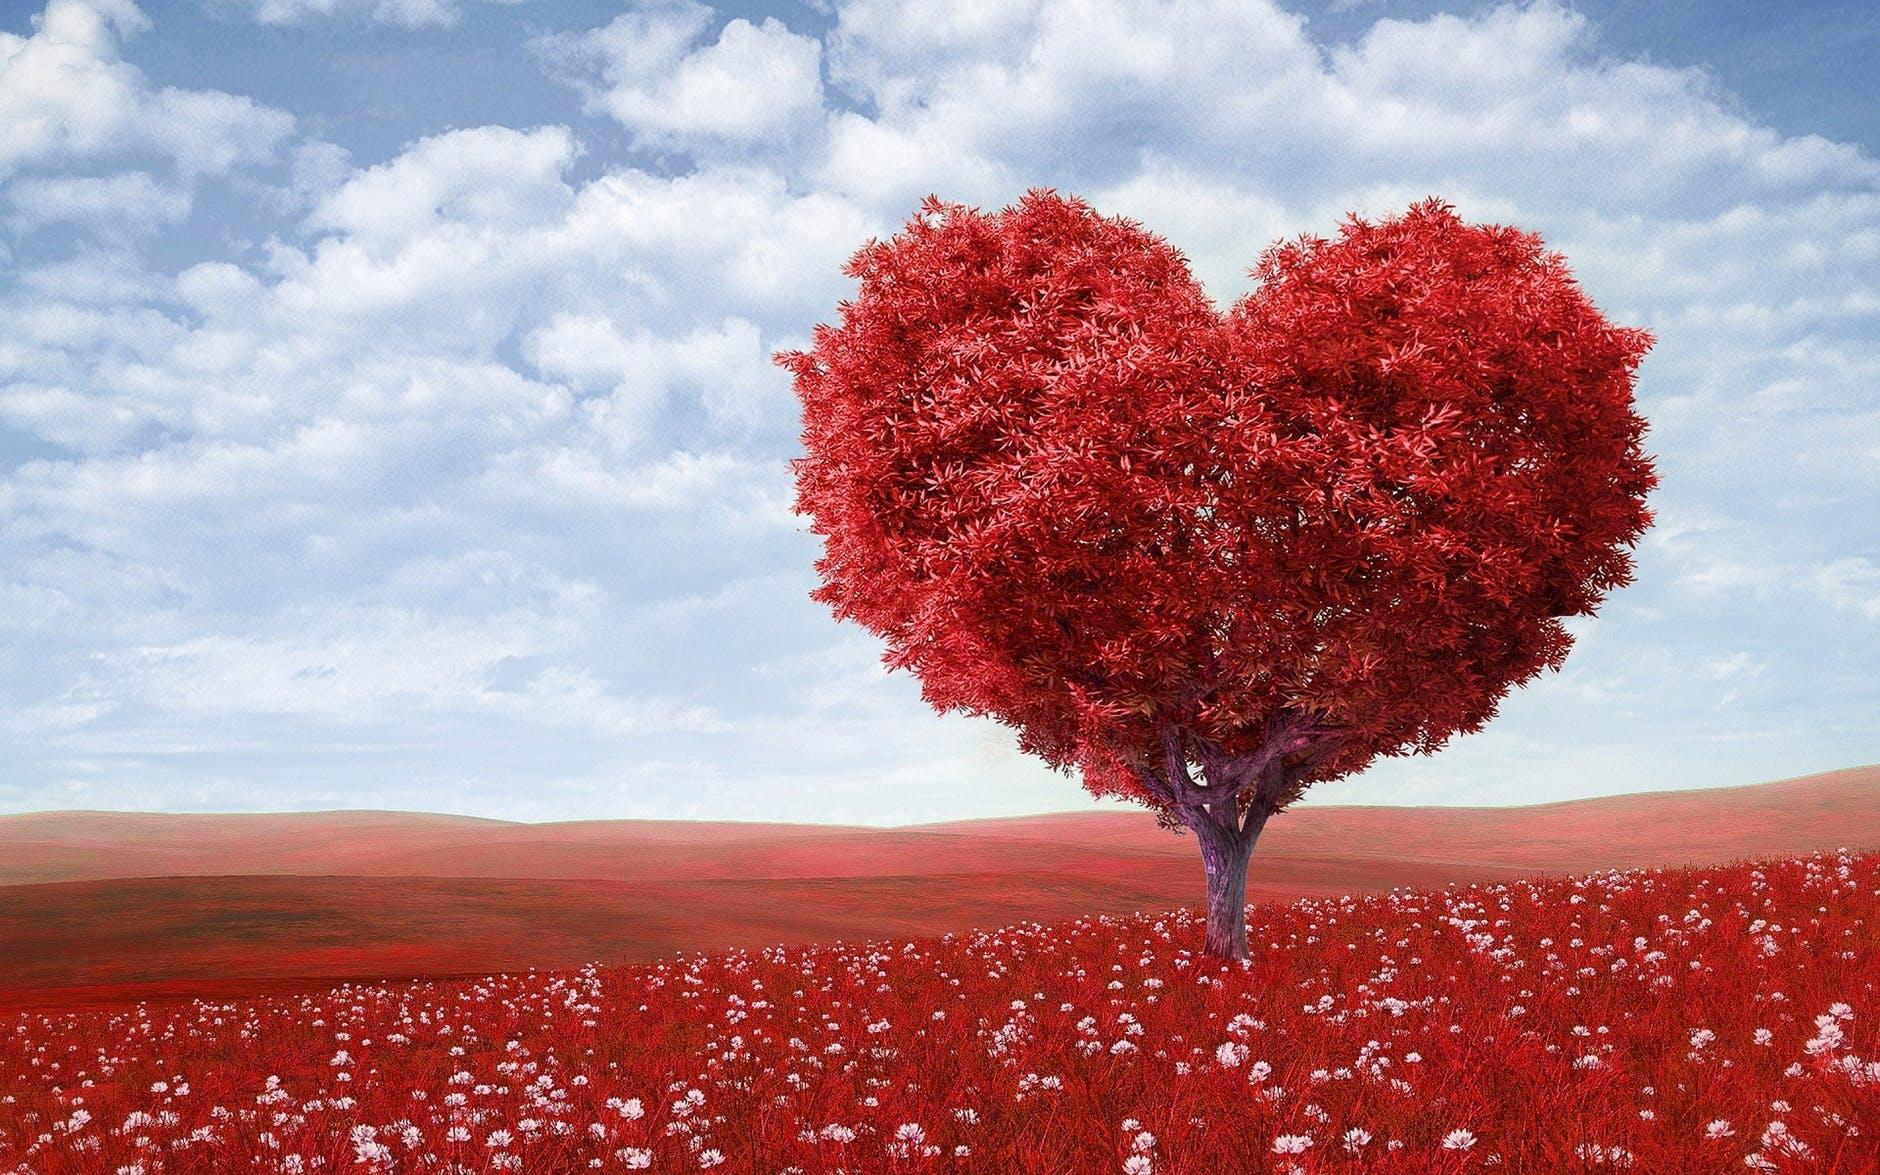 A big heart full of love